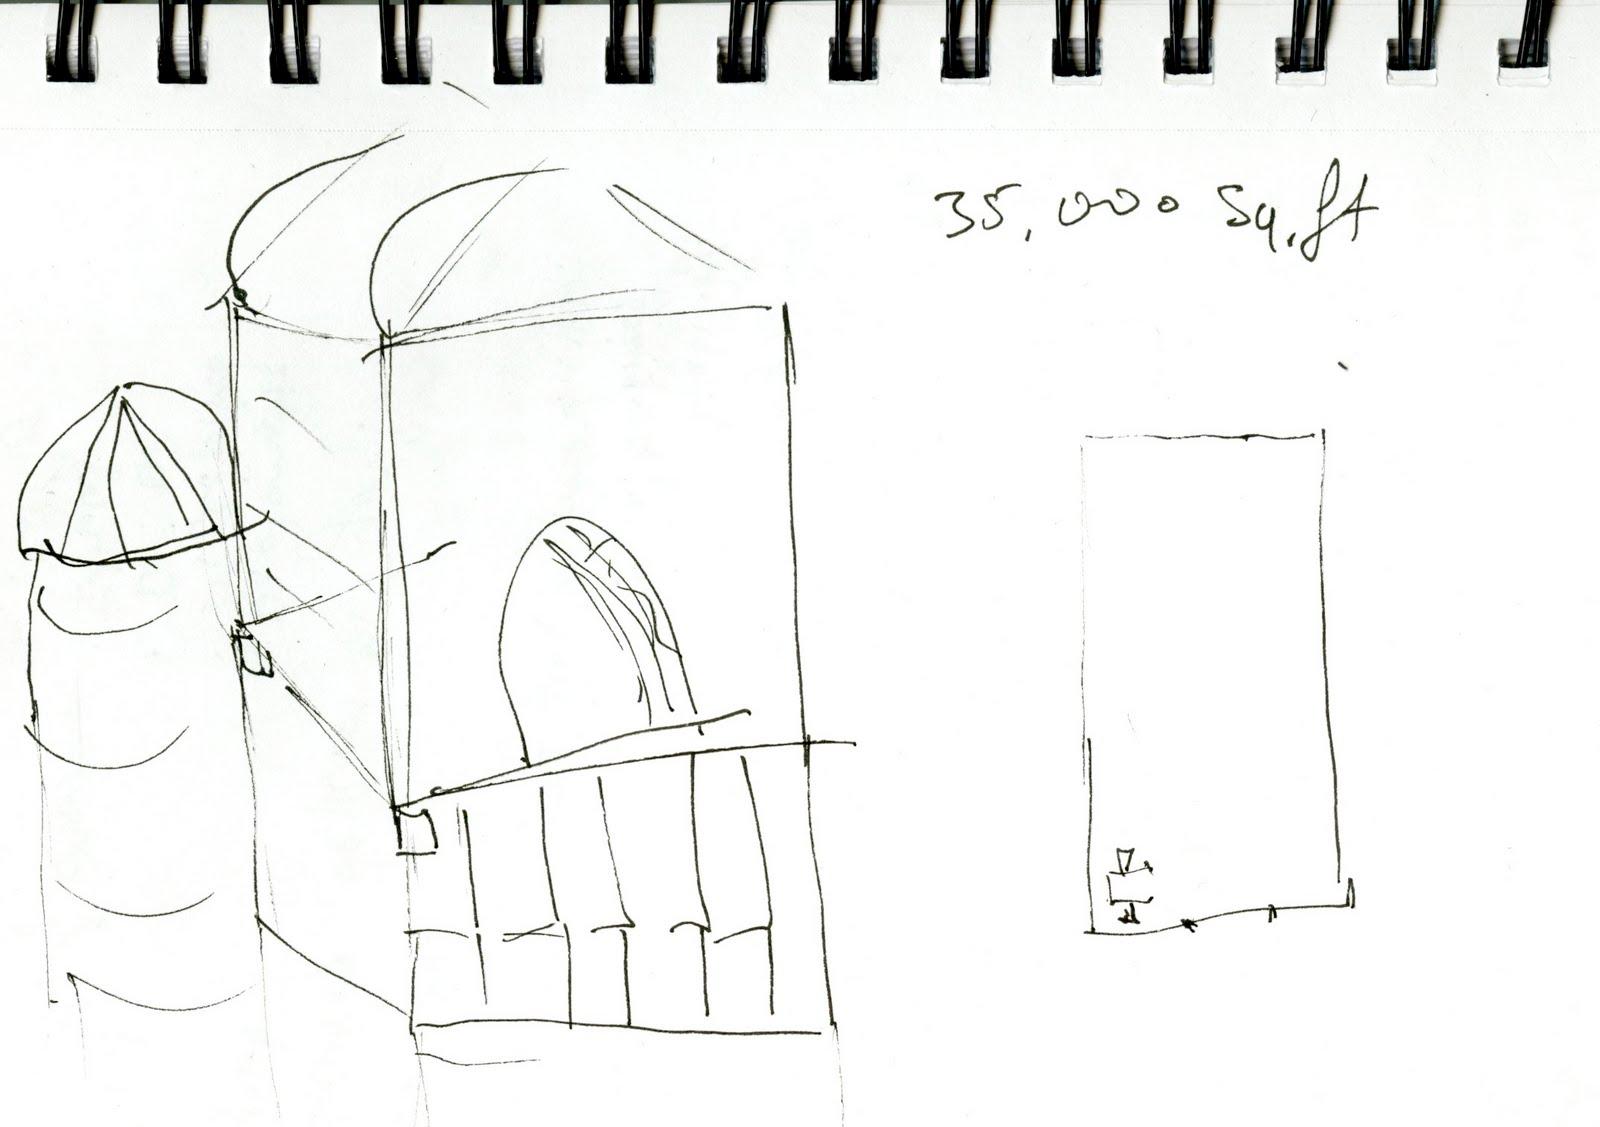 ino-designs: February 2011